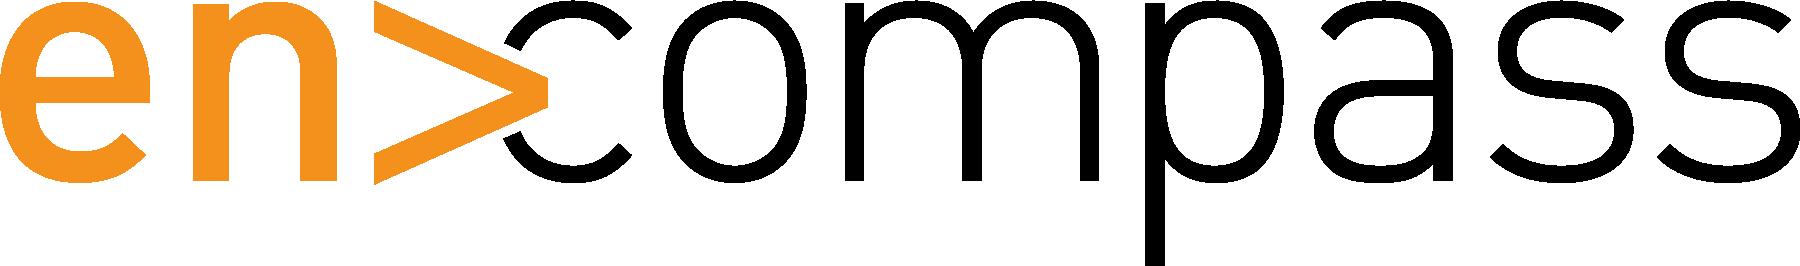 encompass_logo_orange_black-1